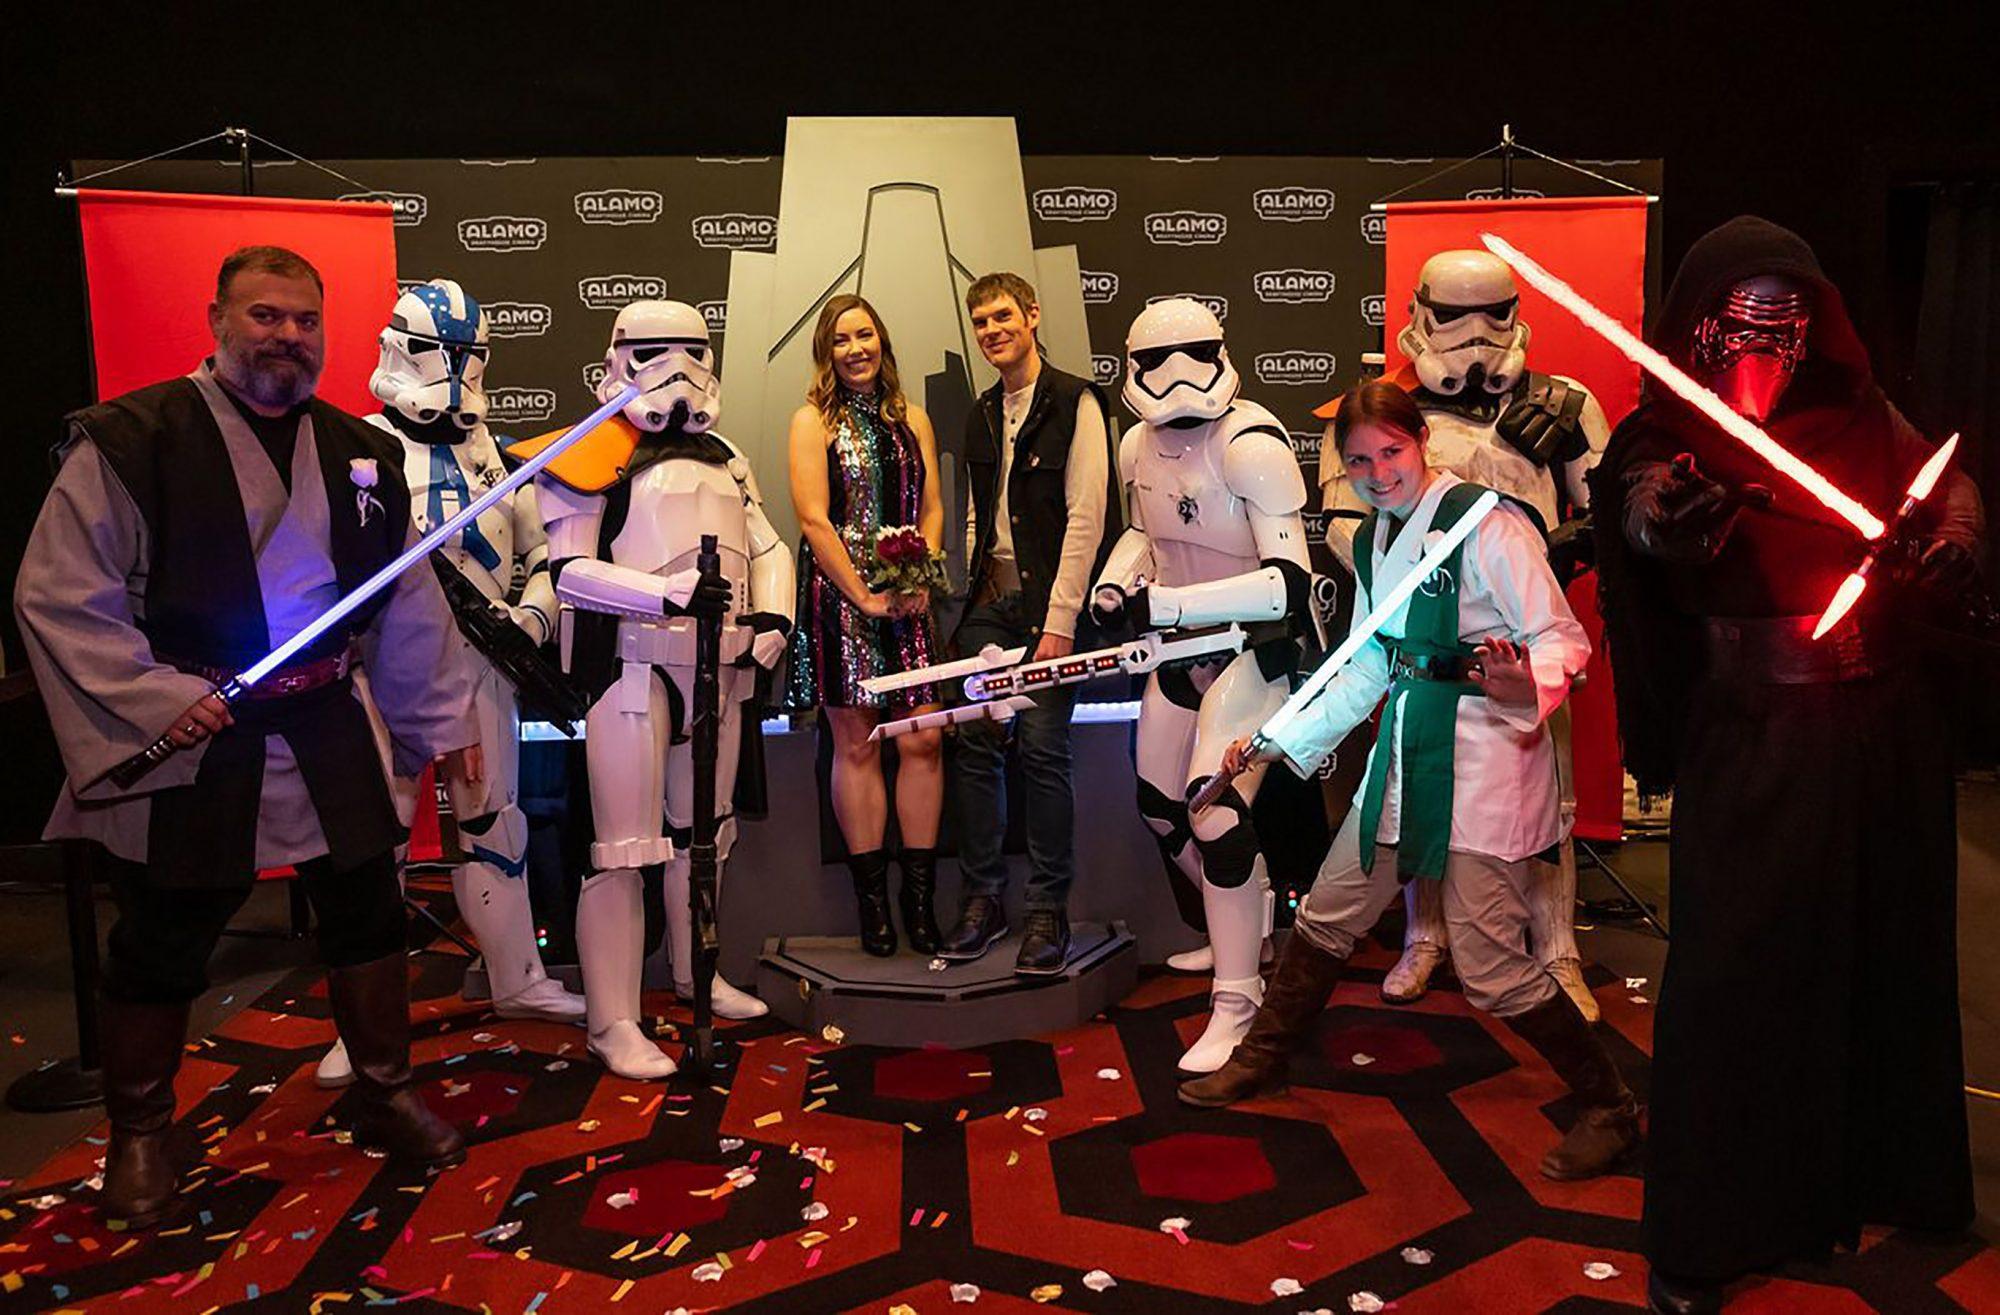 Skywalker Alamo WeddingPhoto Credit: Erika Rich